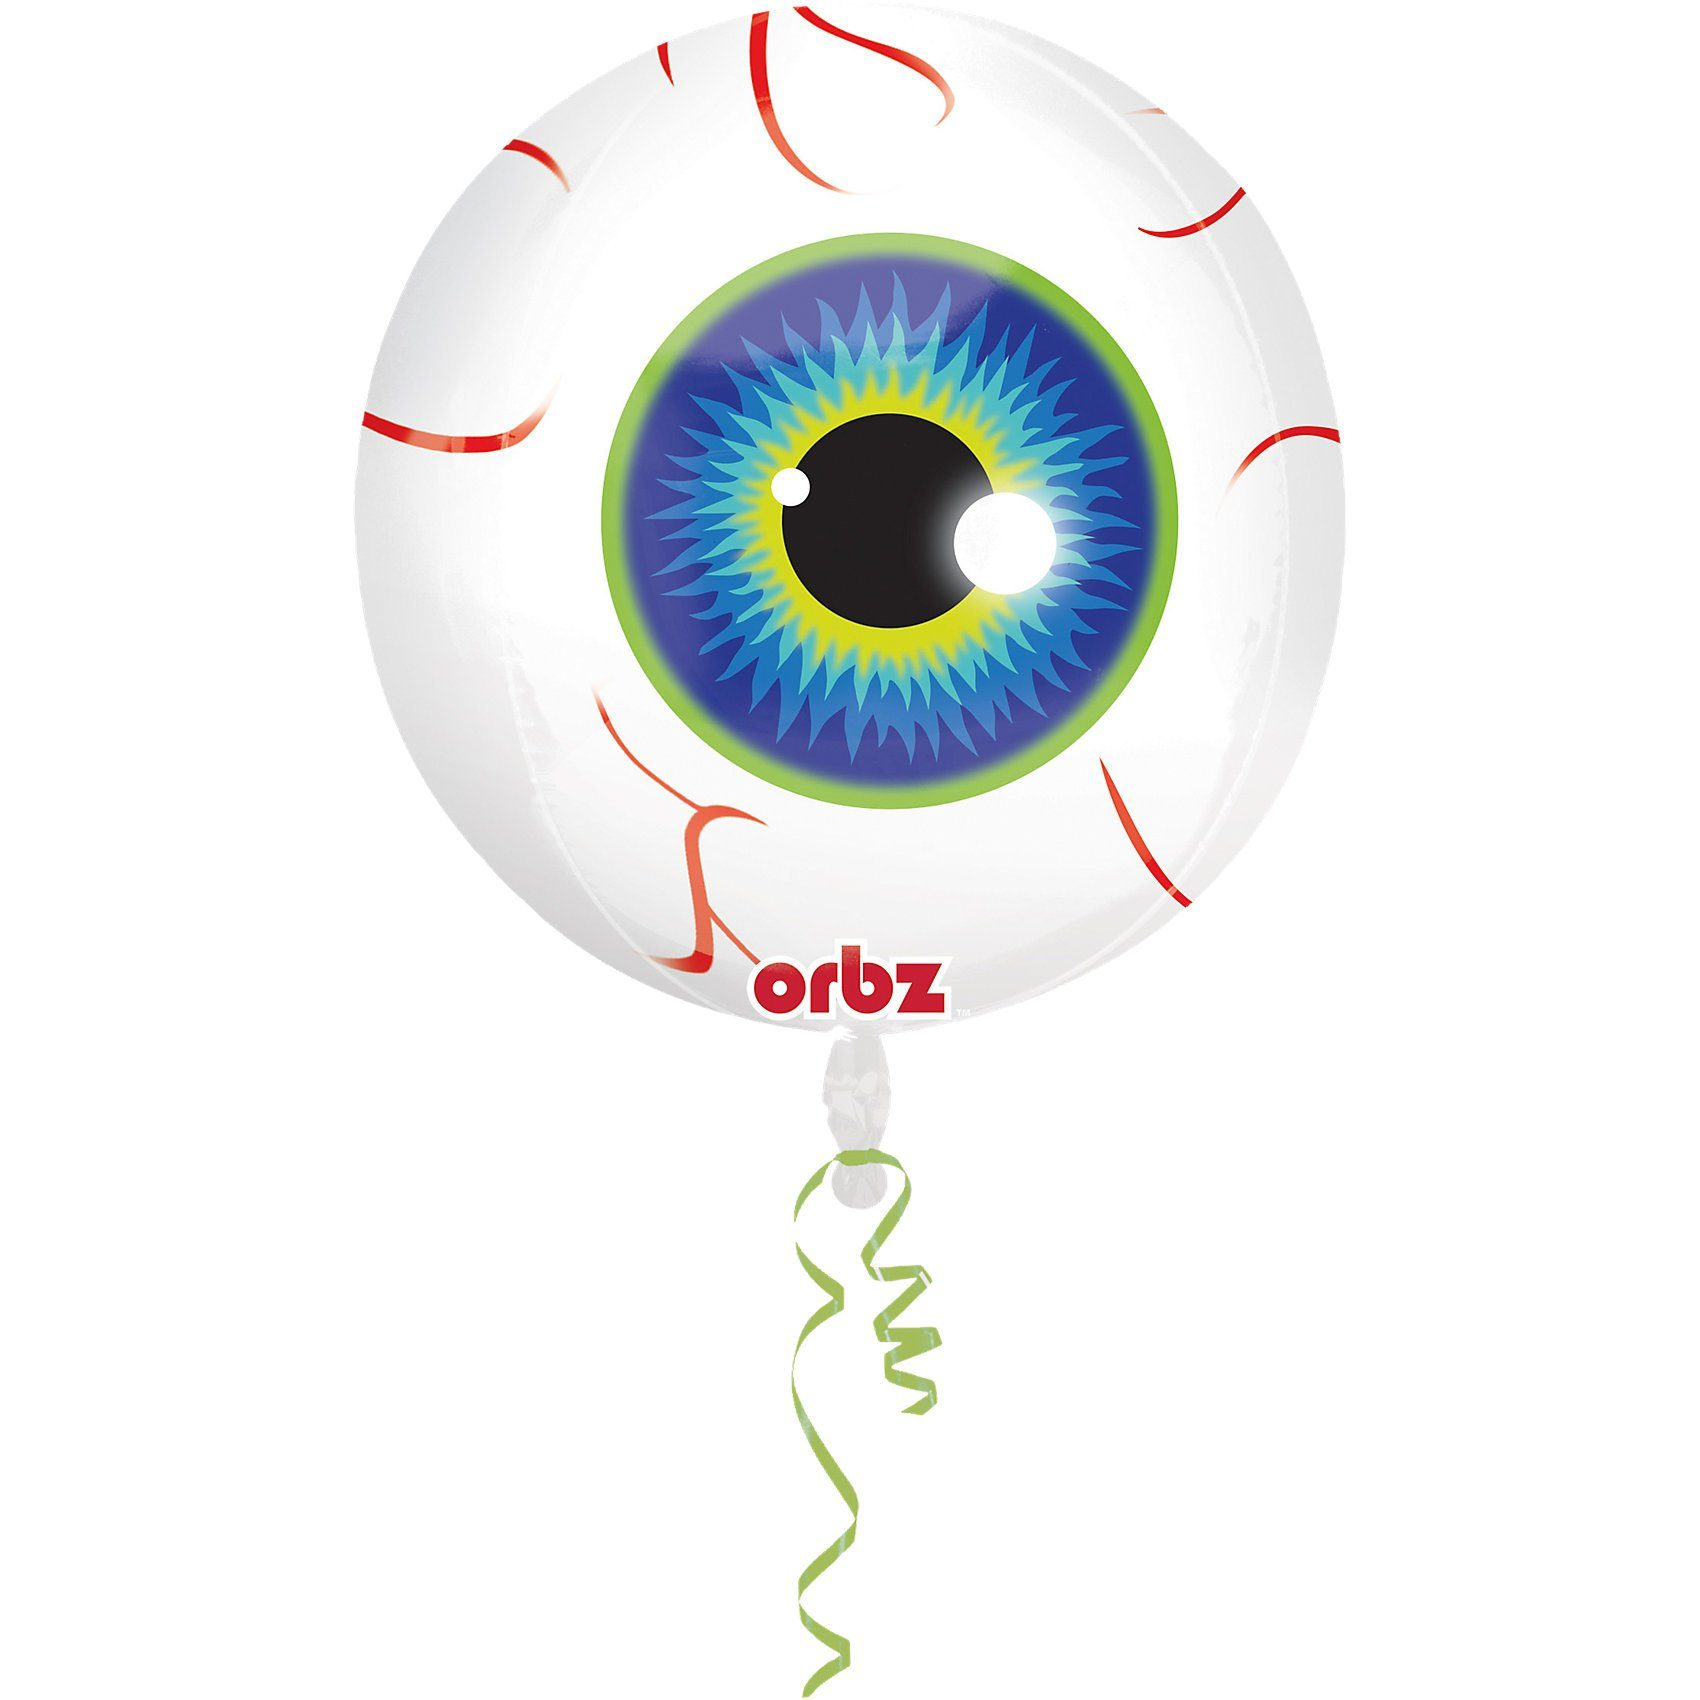 Amscan Folienballon Orbz Auge Halloween Classic